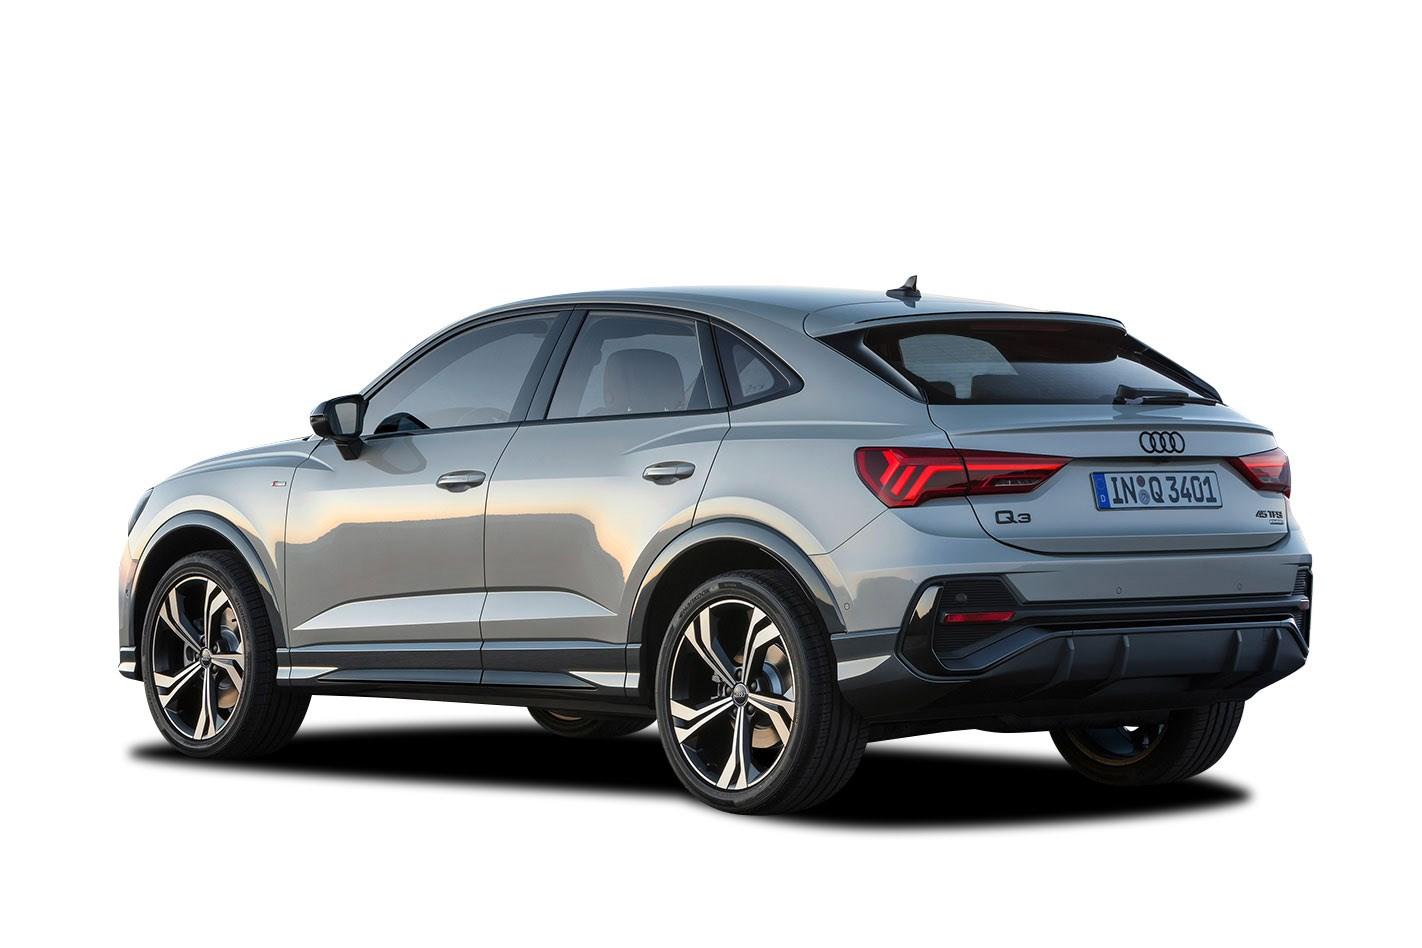 2020 Audi Q3 Sportback 35 Tfsi Launch Edition 1 4l 4cyl Petrol Turbocharged Automatic Suv